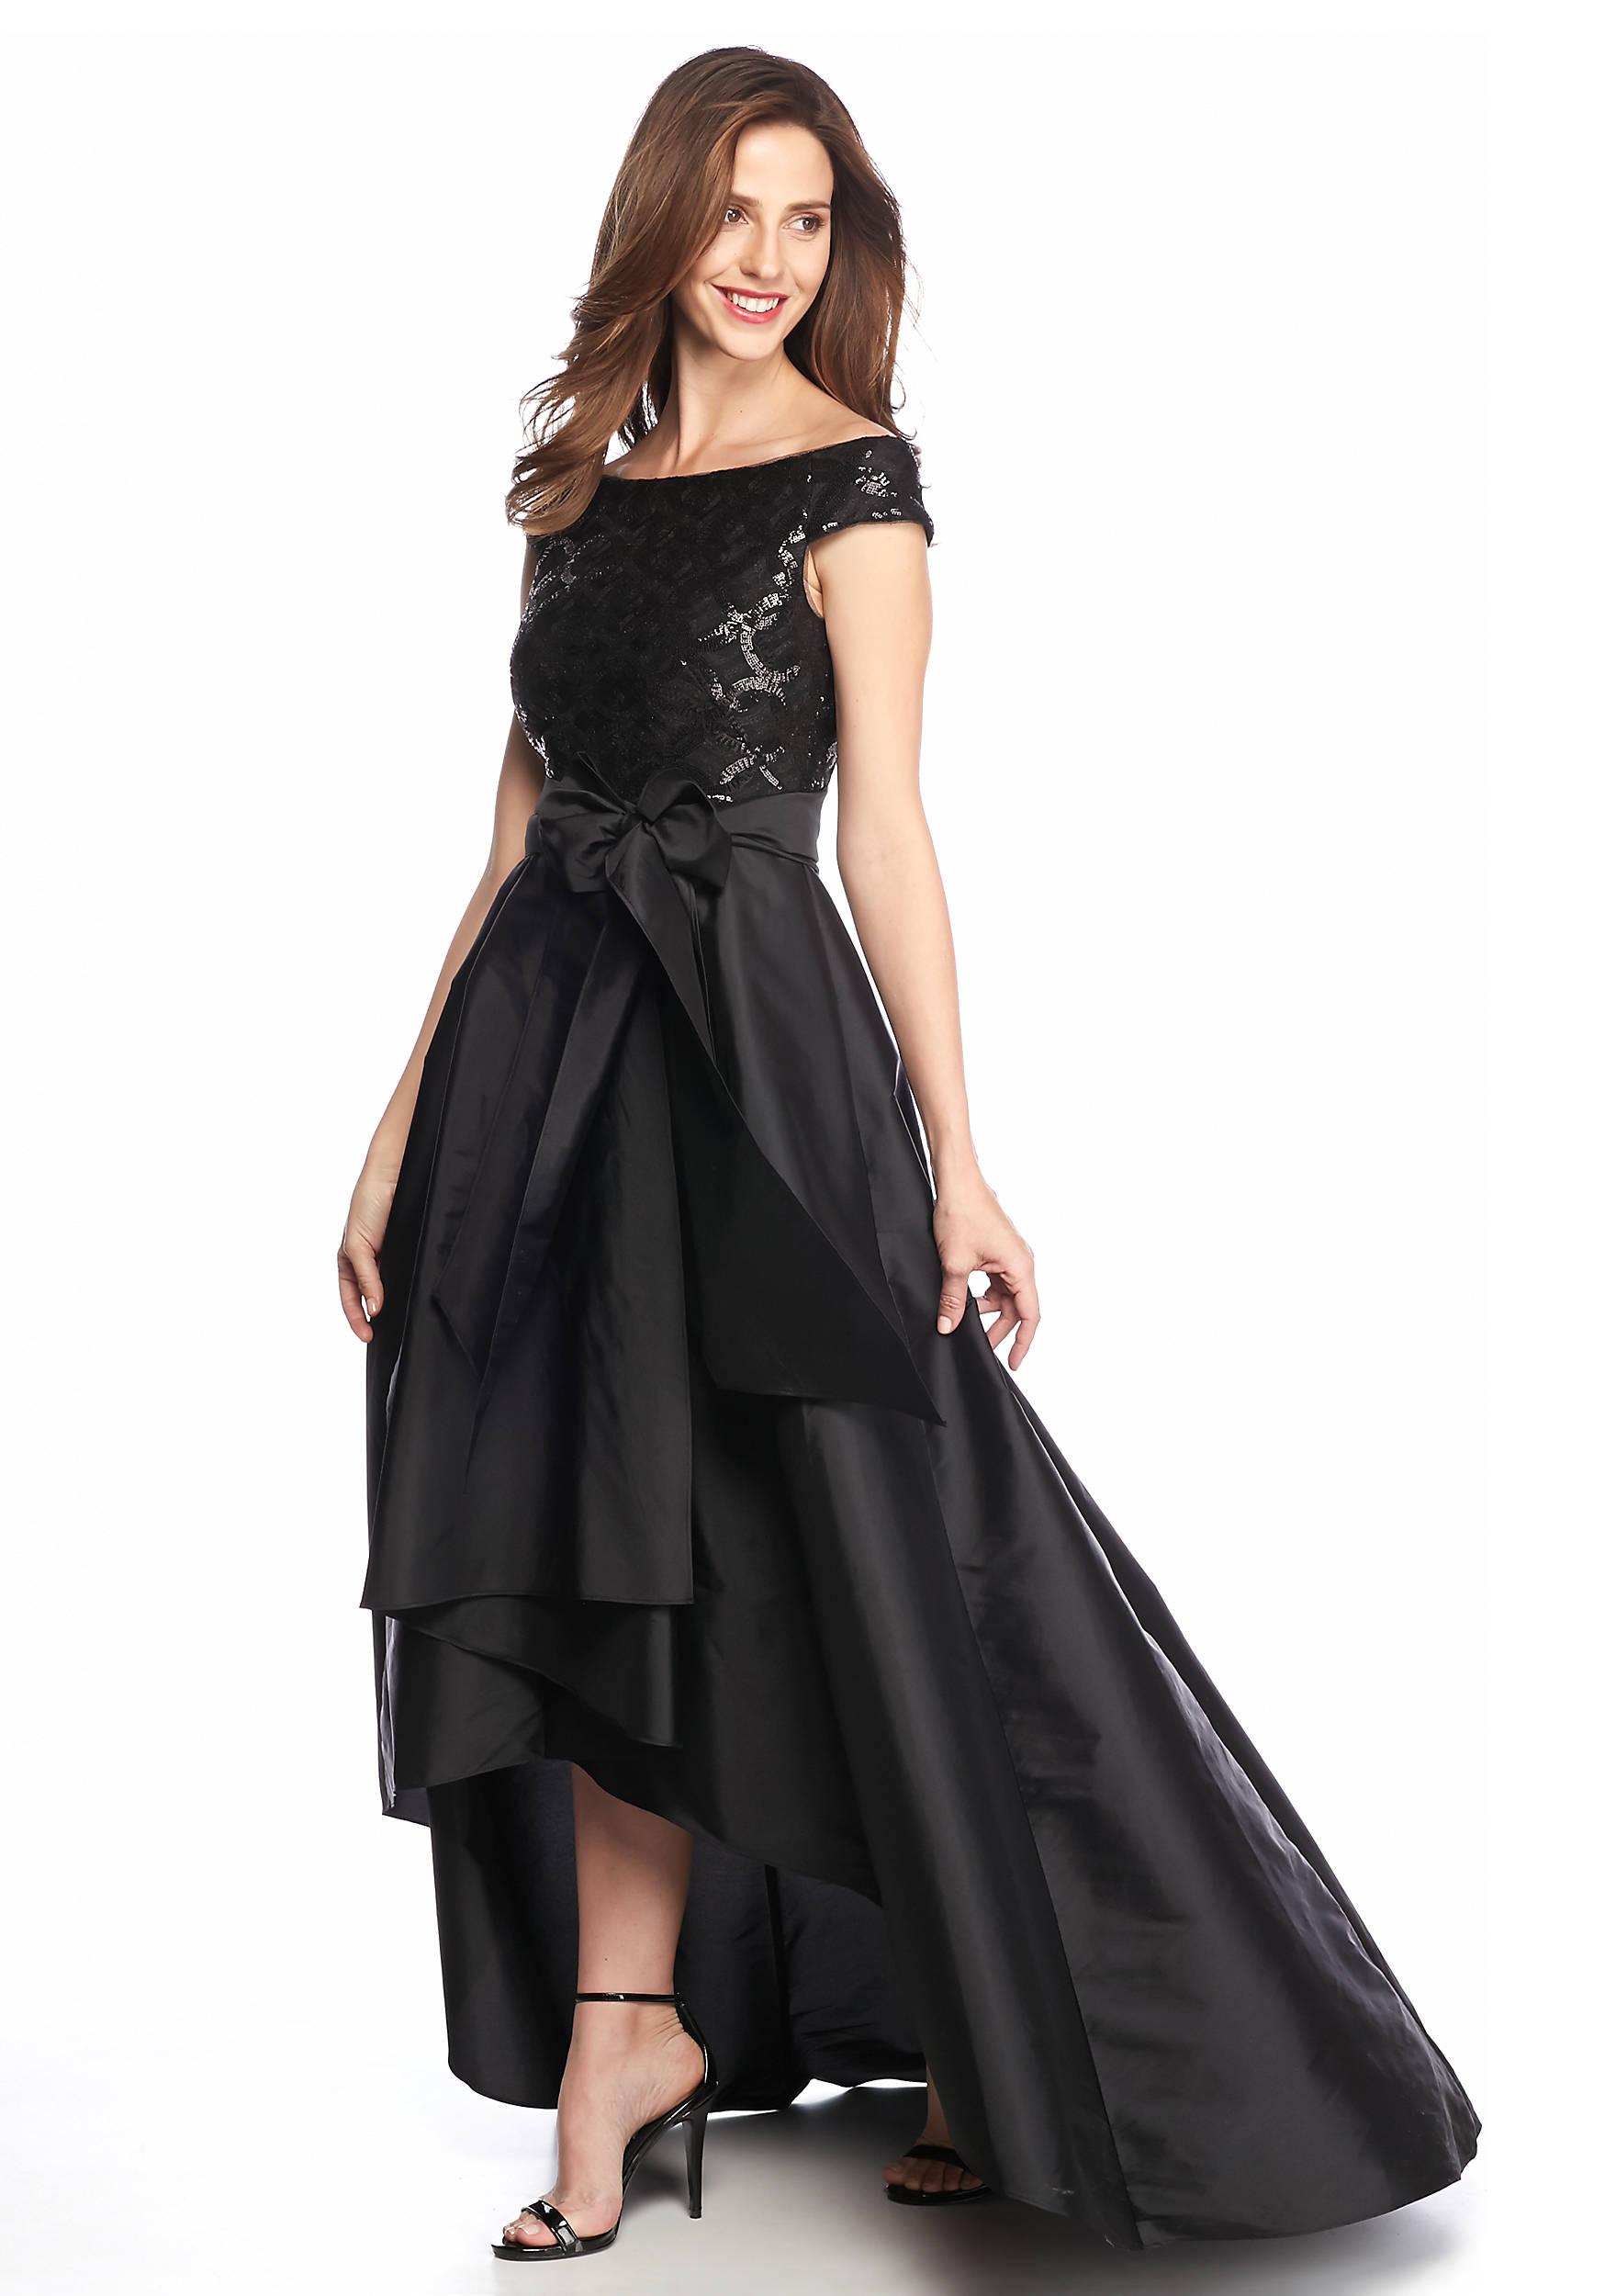 282ff7bf57 Belk Junior Semi Formal Dresses - Gomes Weine AG